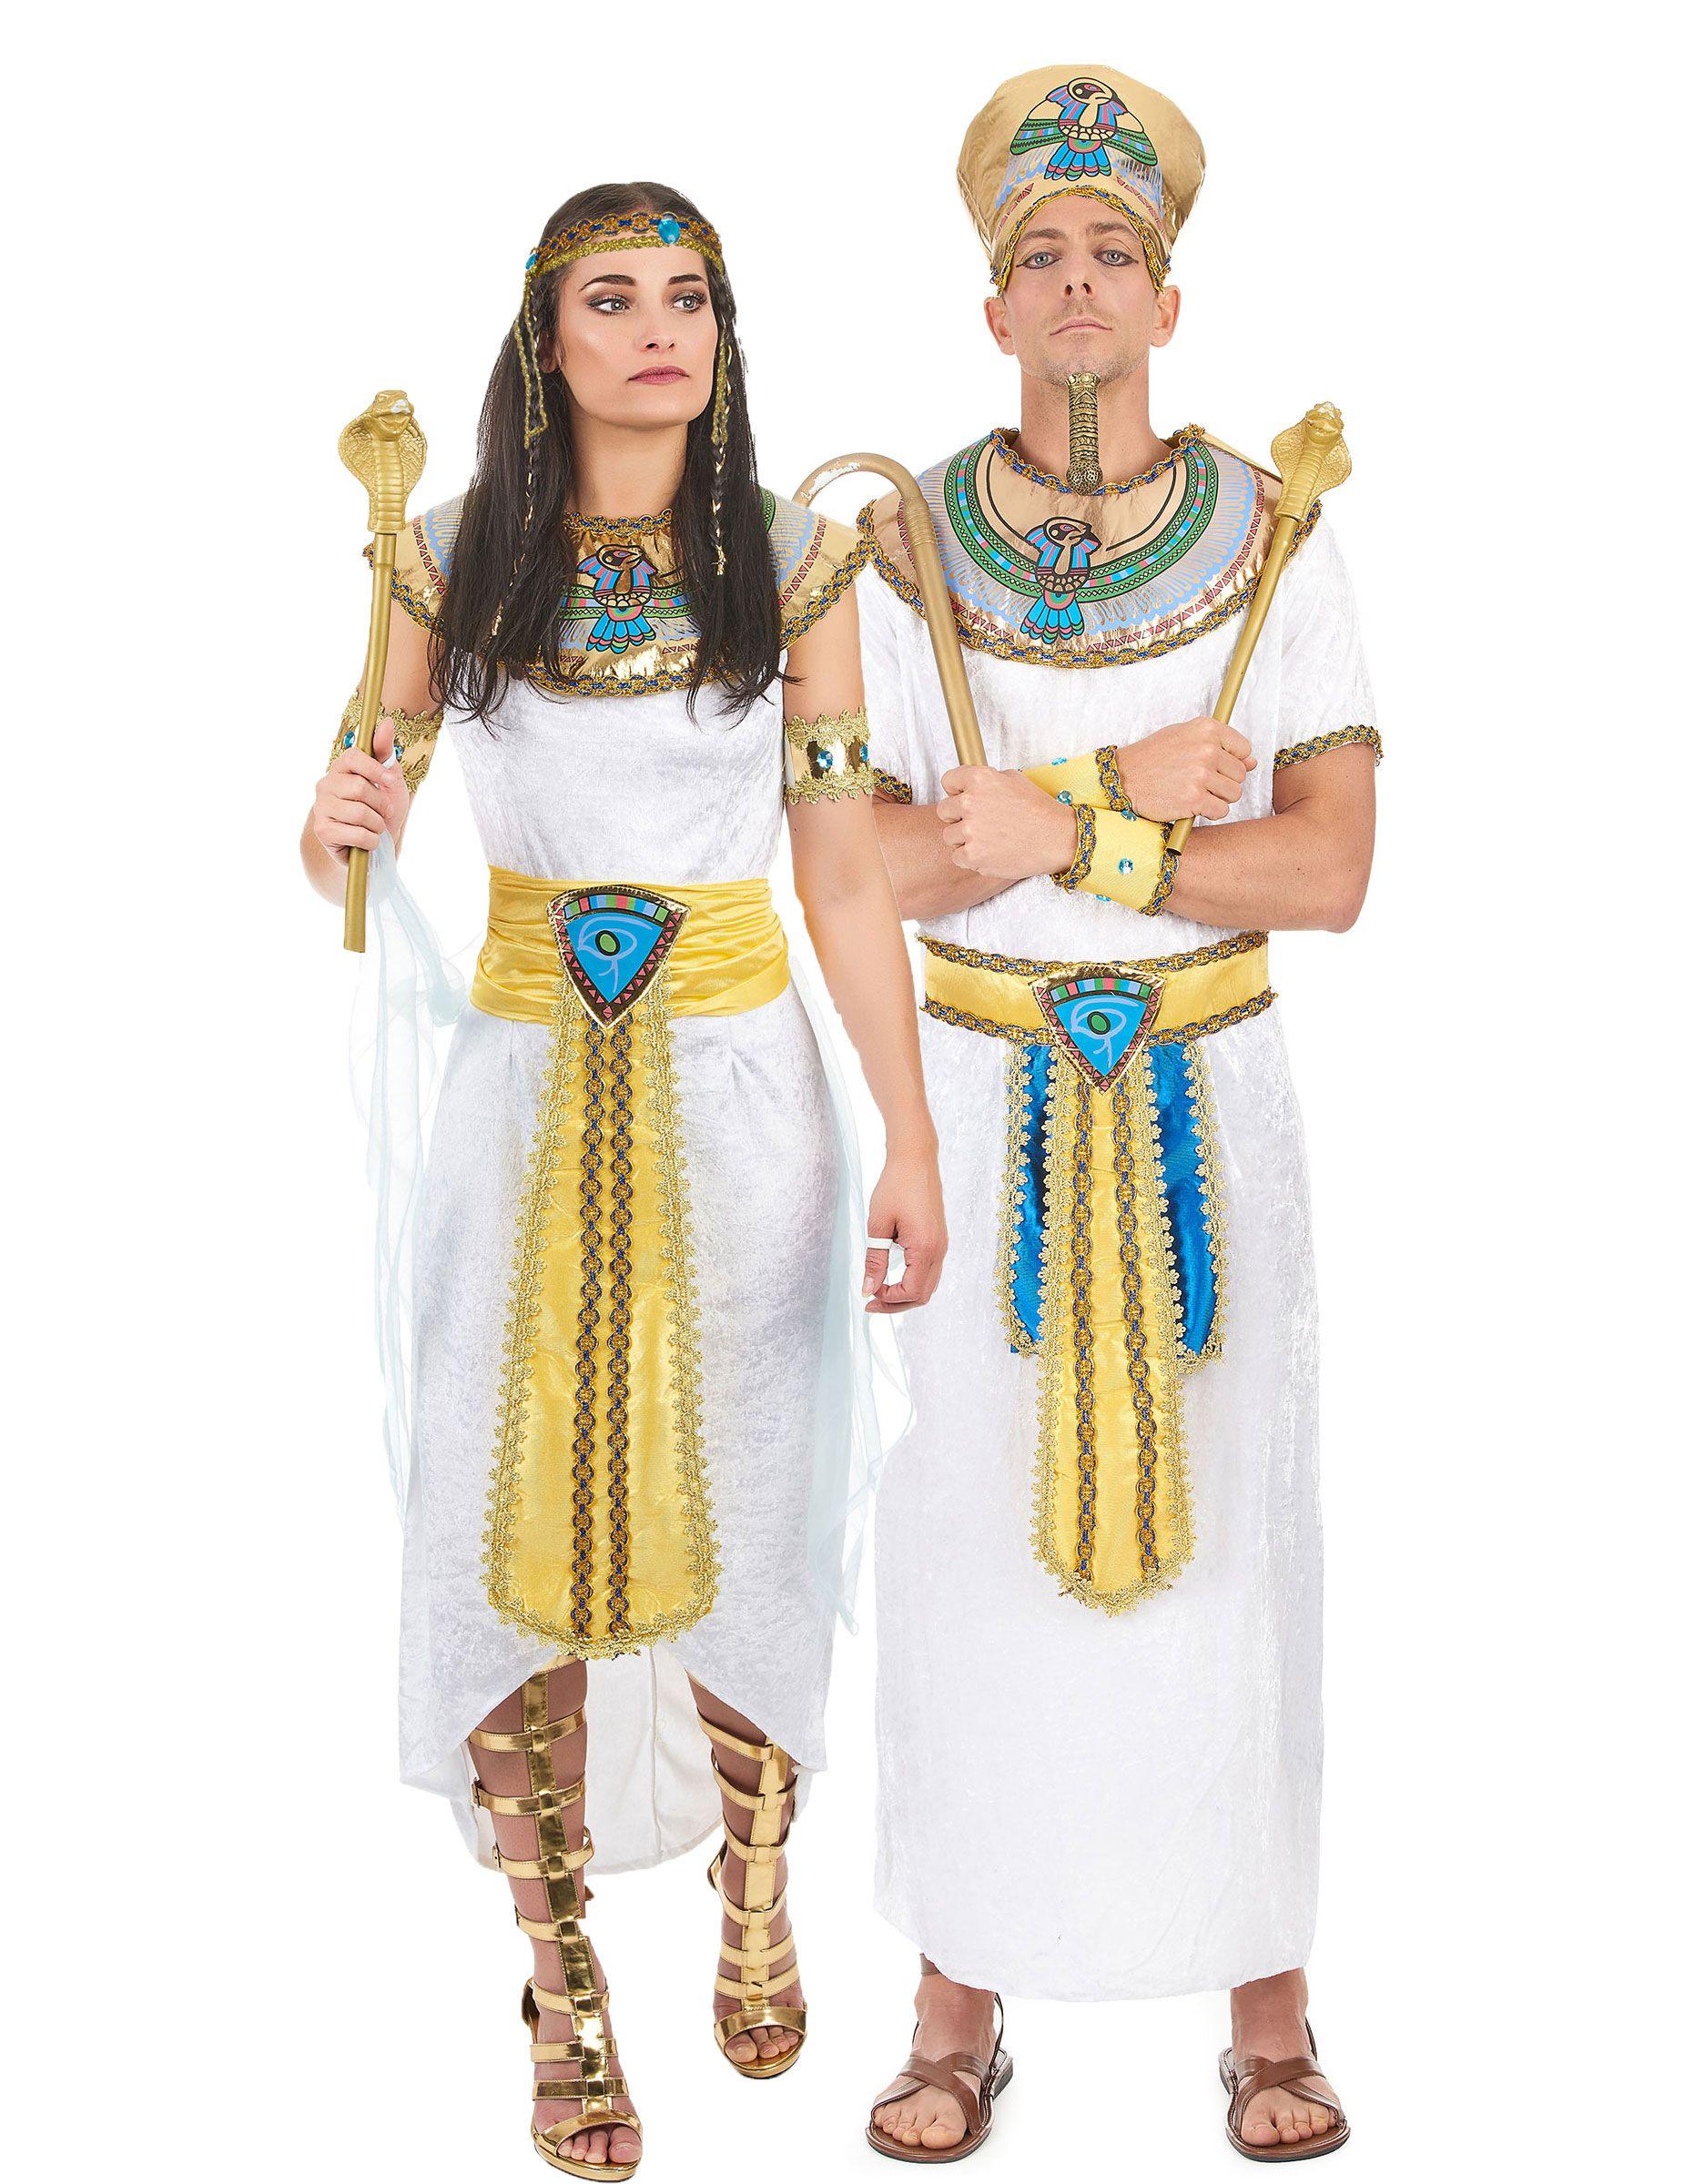 Costume coppia egiziana  Costume da regina egiziana donna Questo costume da  regina egiziana da donna 83643139e66